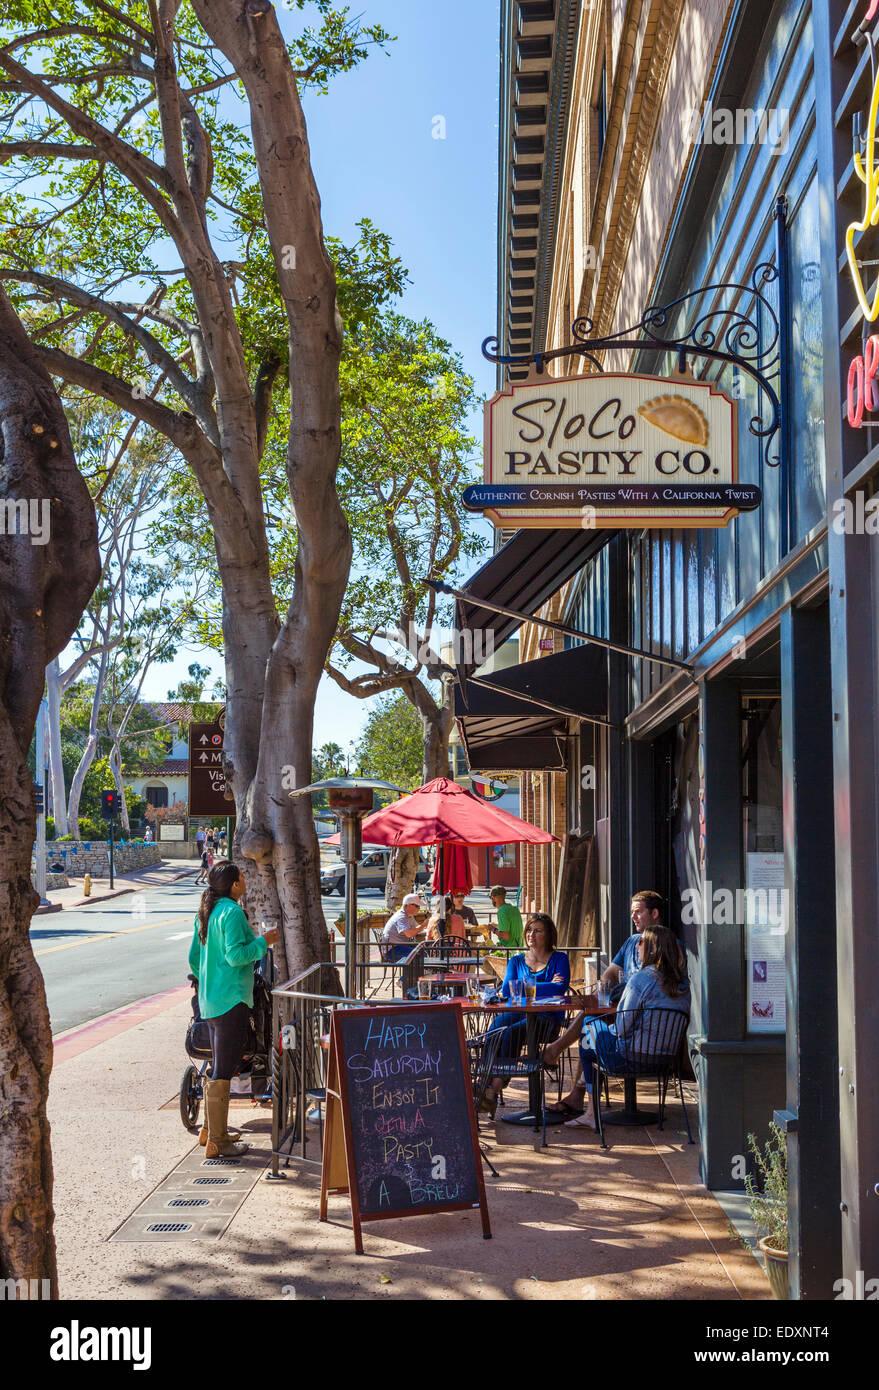 Sidewalk cafe on Chorro Street in downtown San Luis Obispo, California, USA - Stock Image